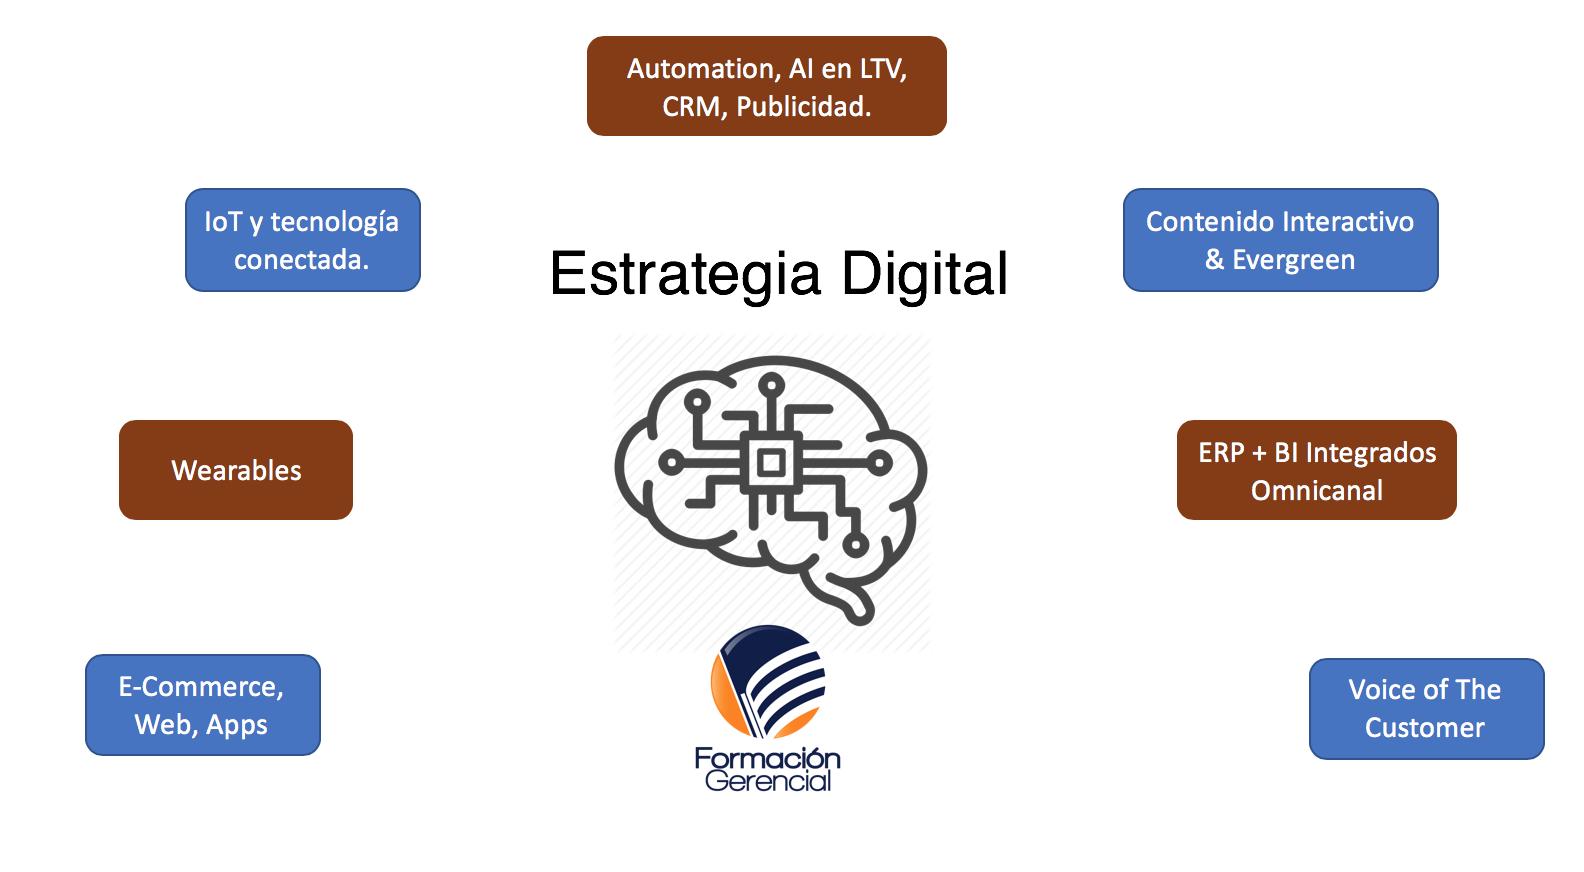 Componentes Estrategia Digital 2018